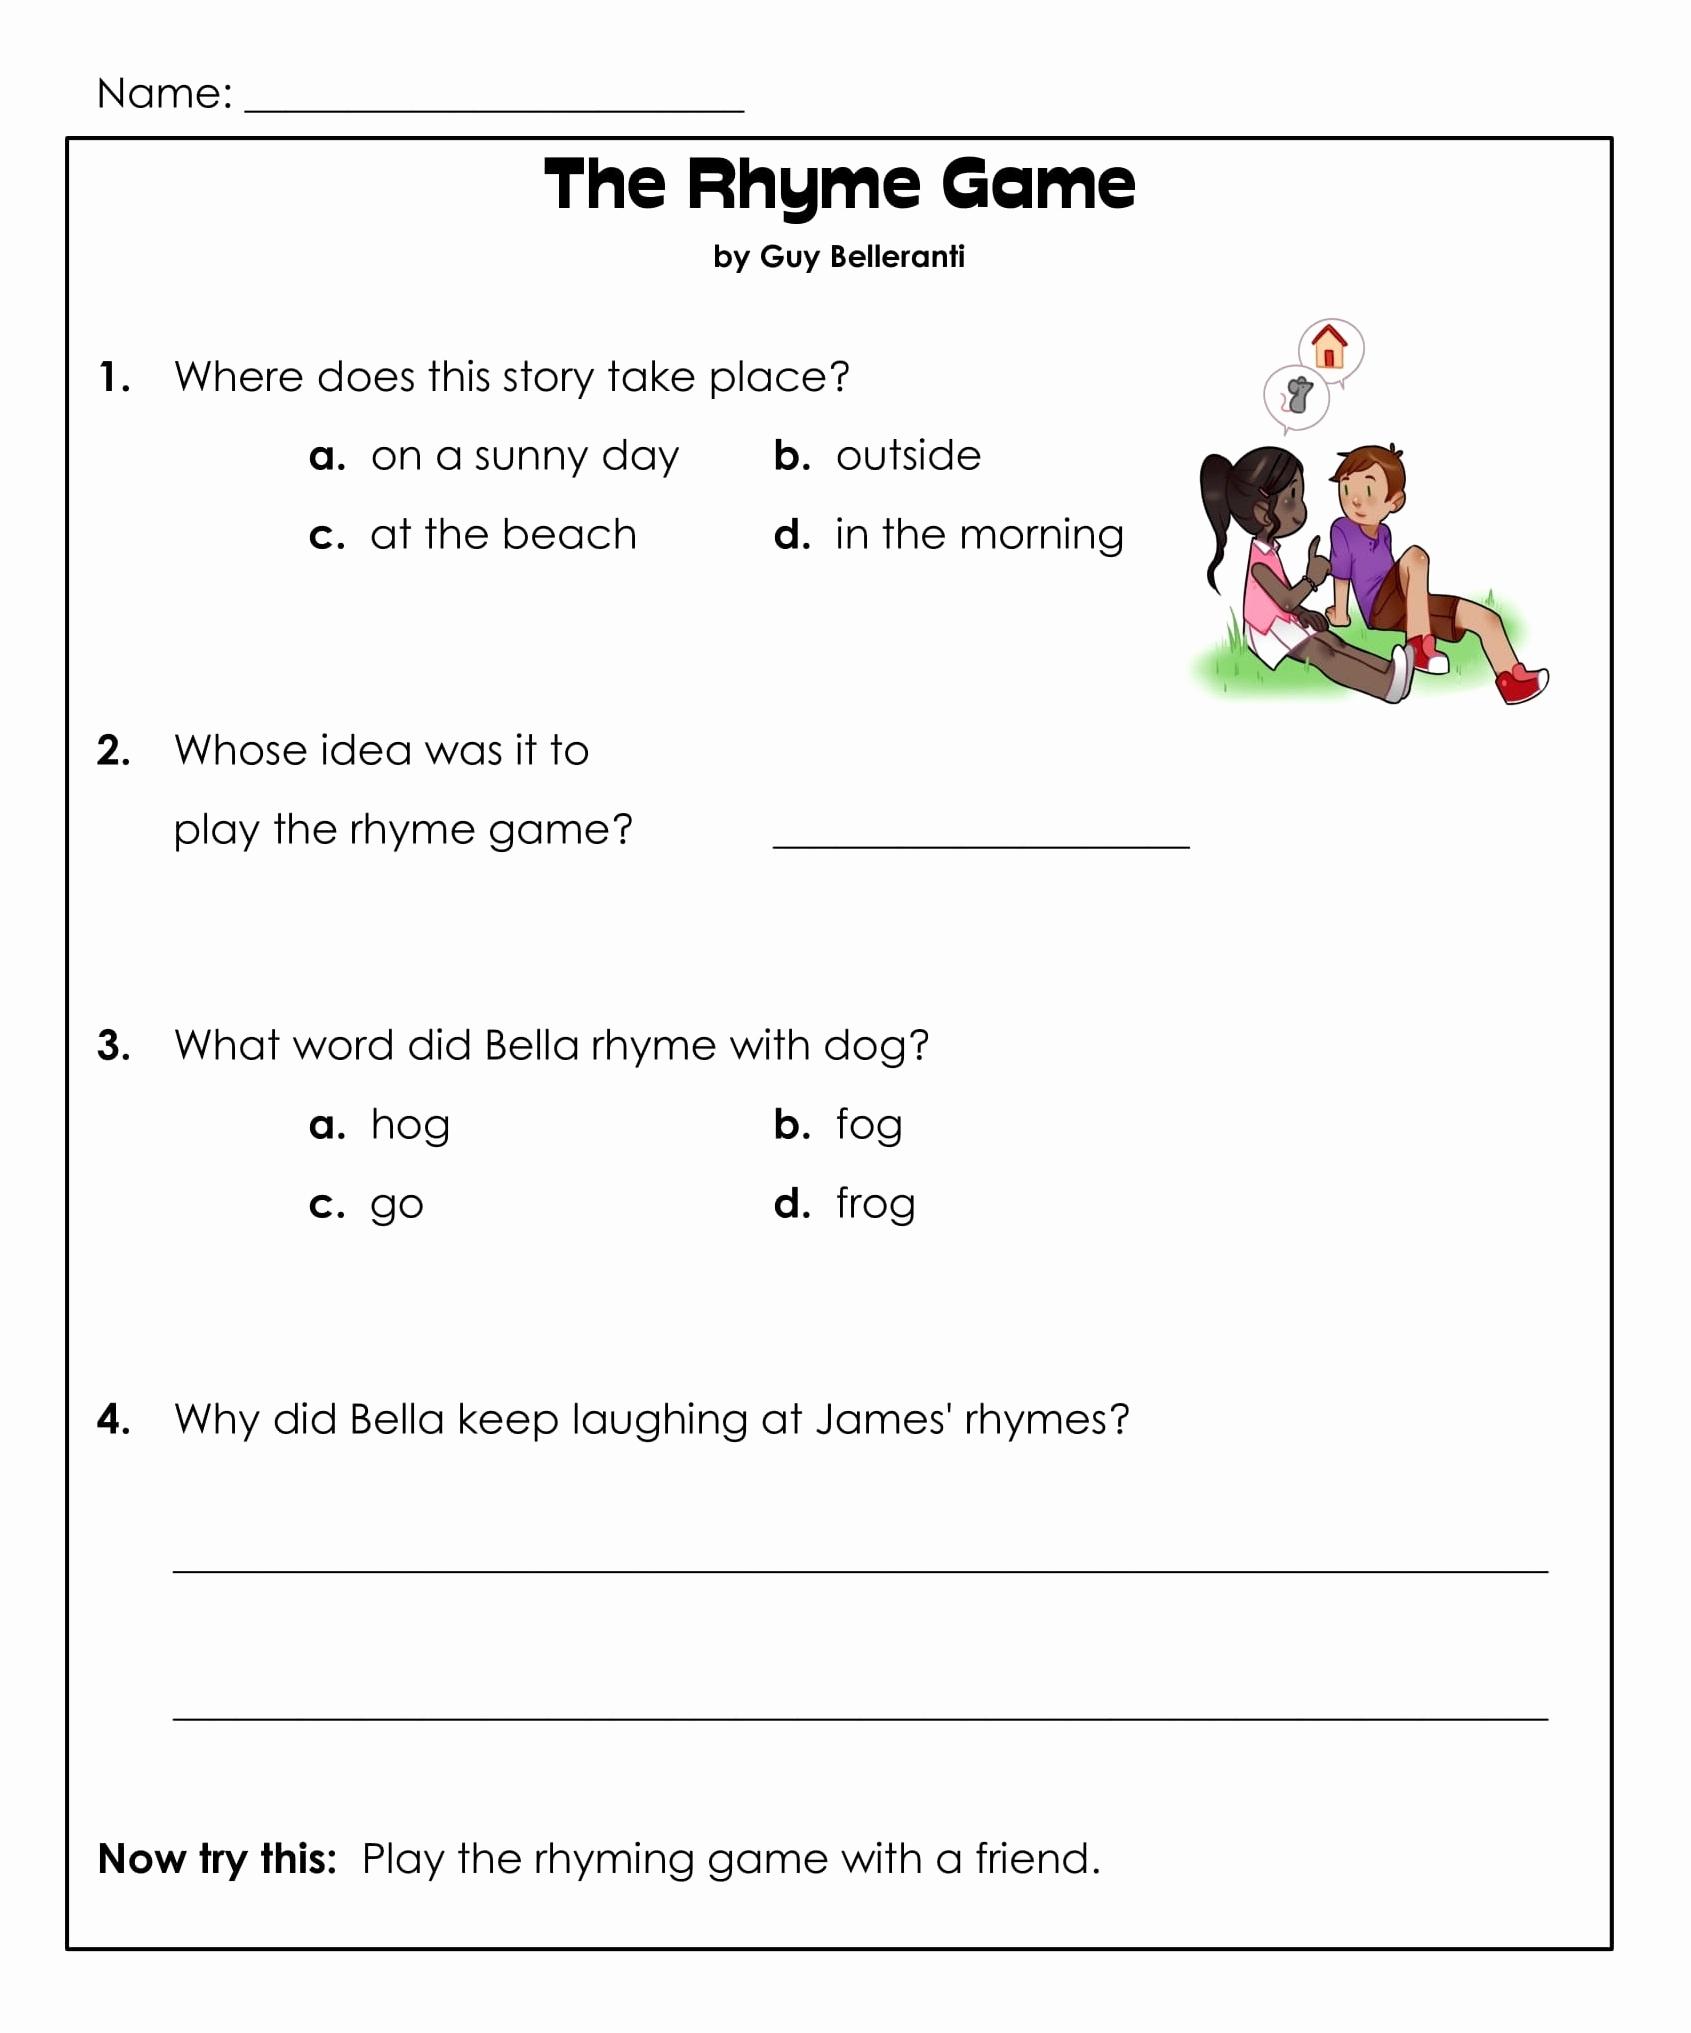 1st Grade Reading Worksheets Printable Beautiful 1st Grade Reading Prehension Worksheets Printable Pdf